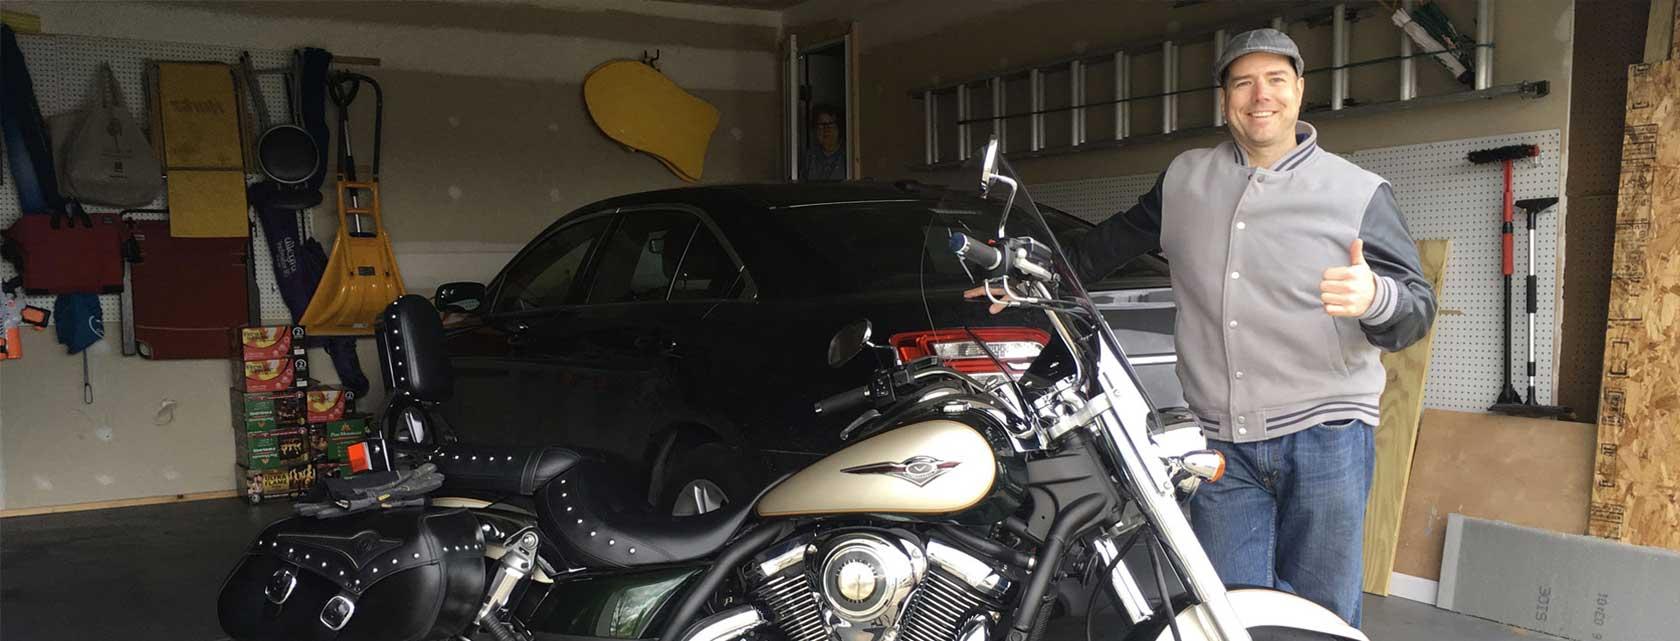 sell Harley